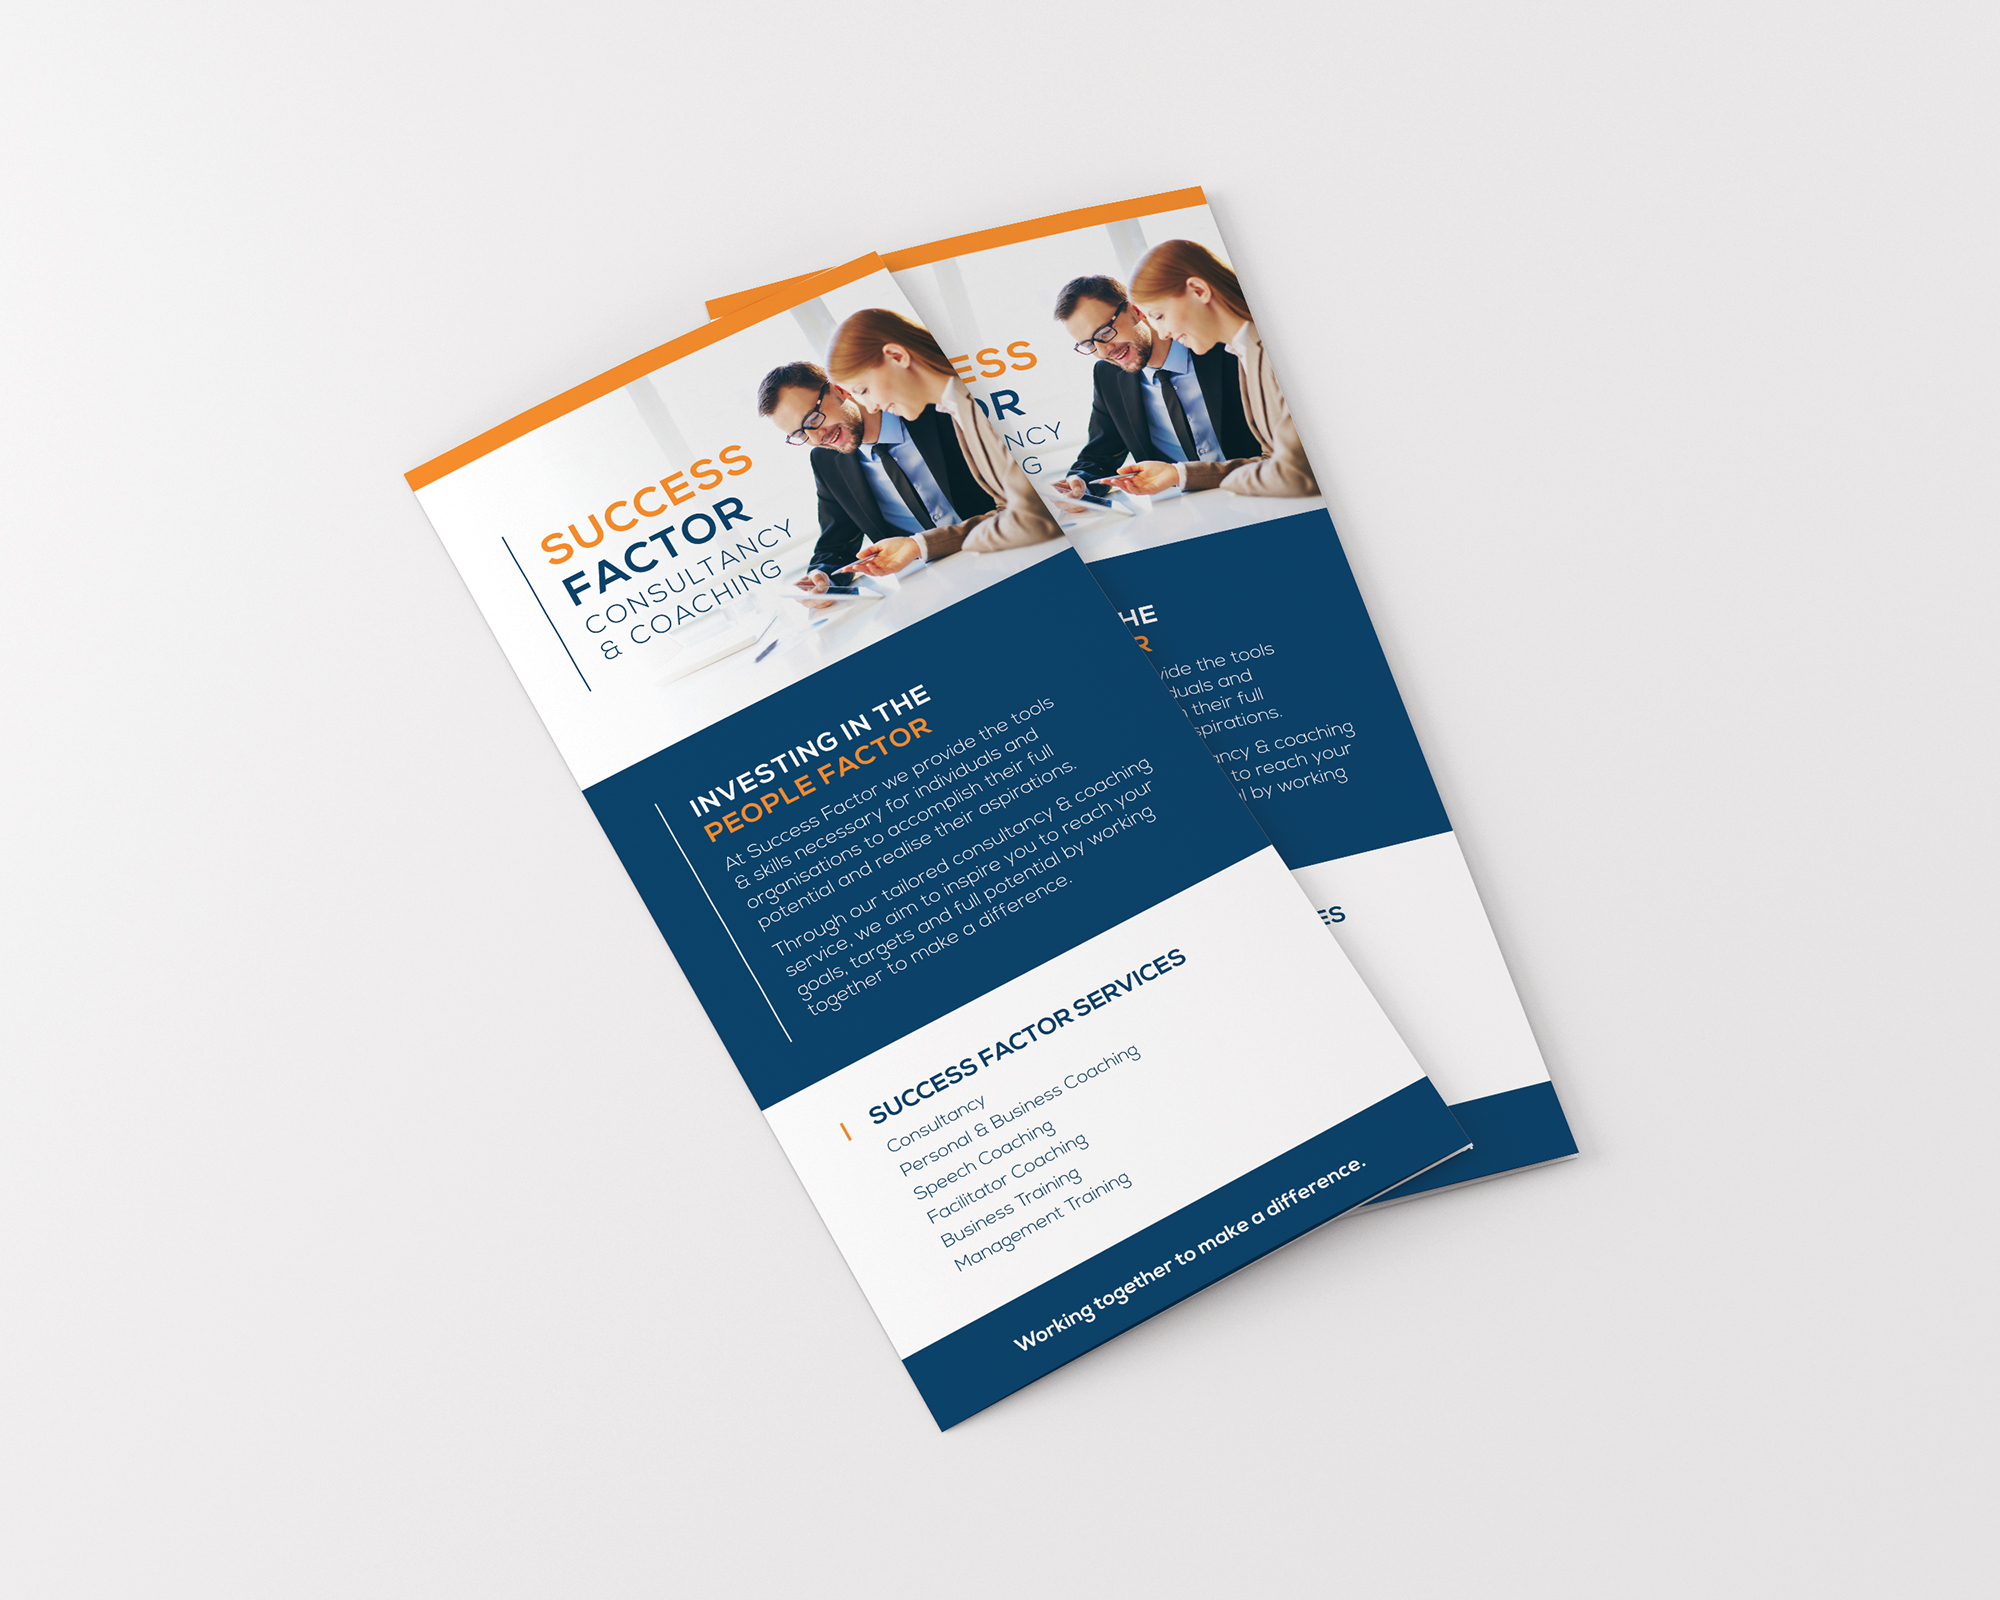 Success Factor DL Brochure Design.